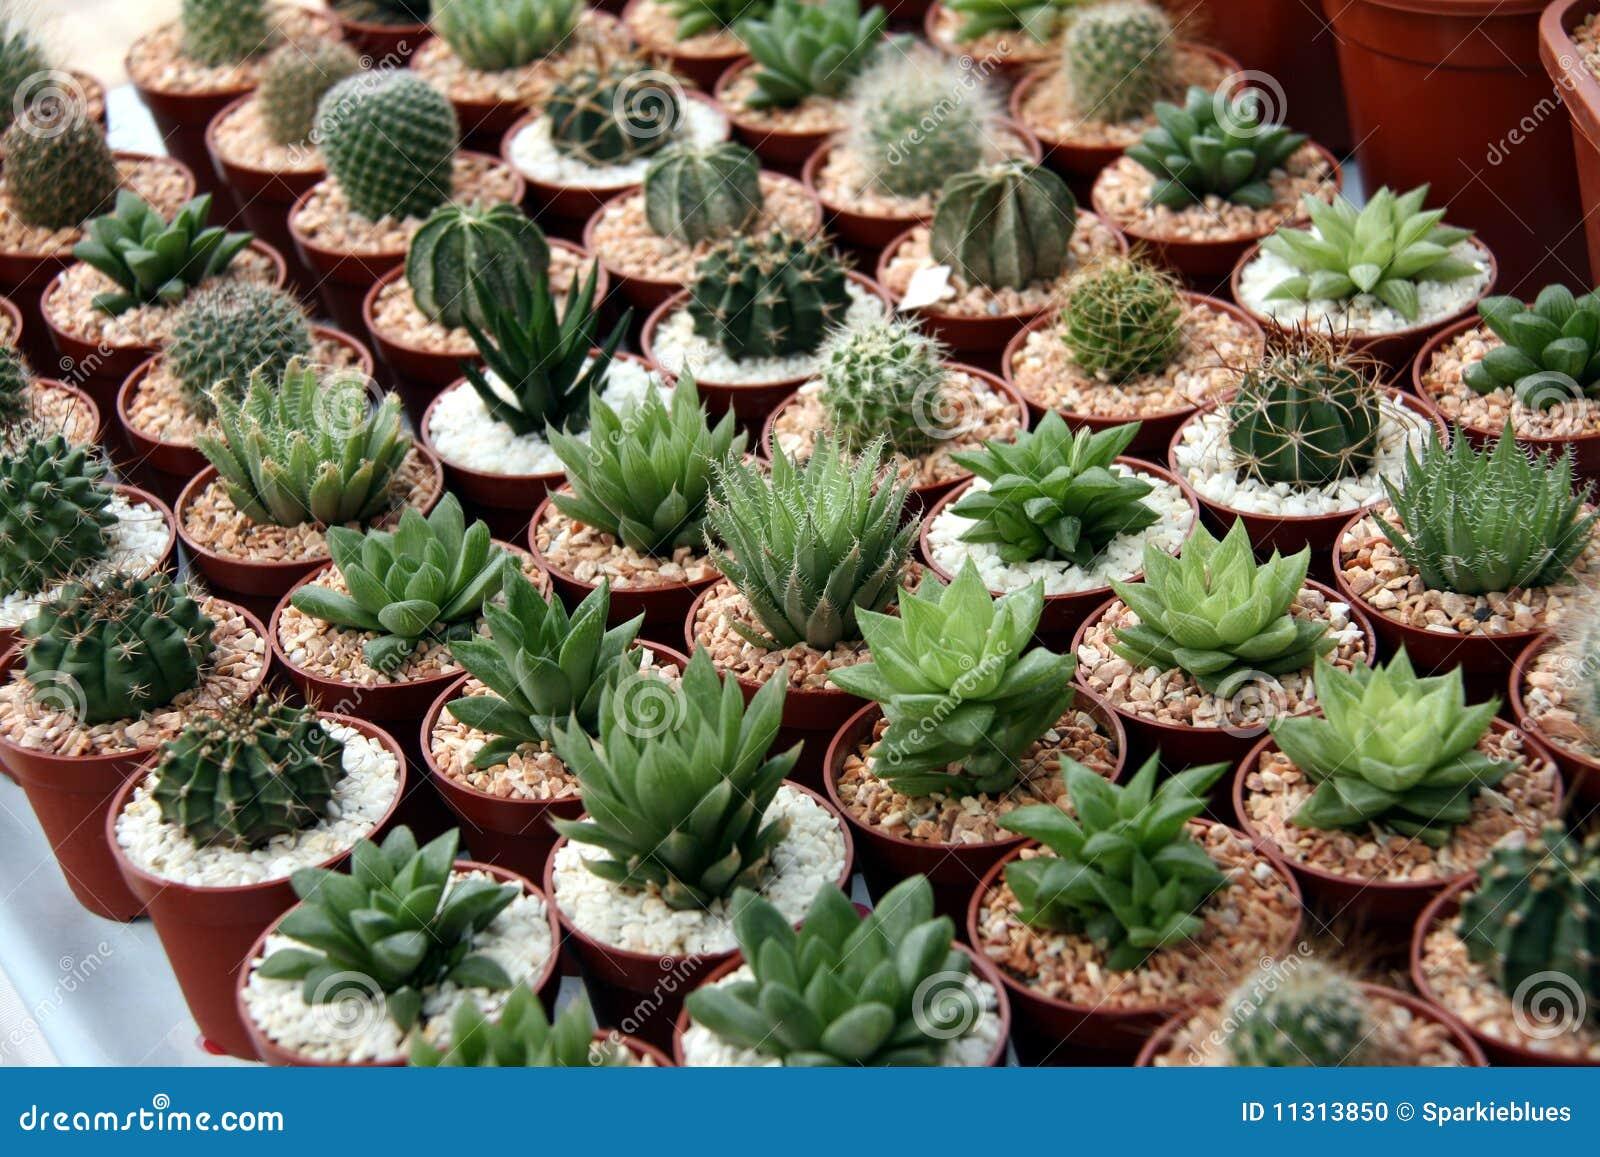 miniature cacti stock photo image 11313850. Black Bedroom Furniture Sets. Home Design Ideas